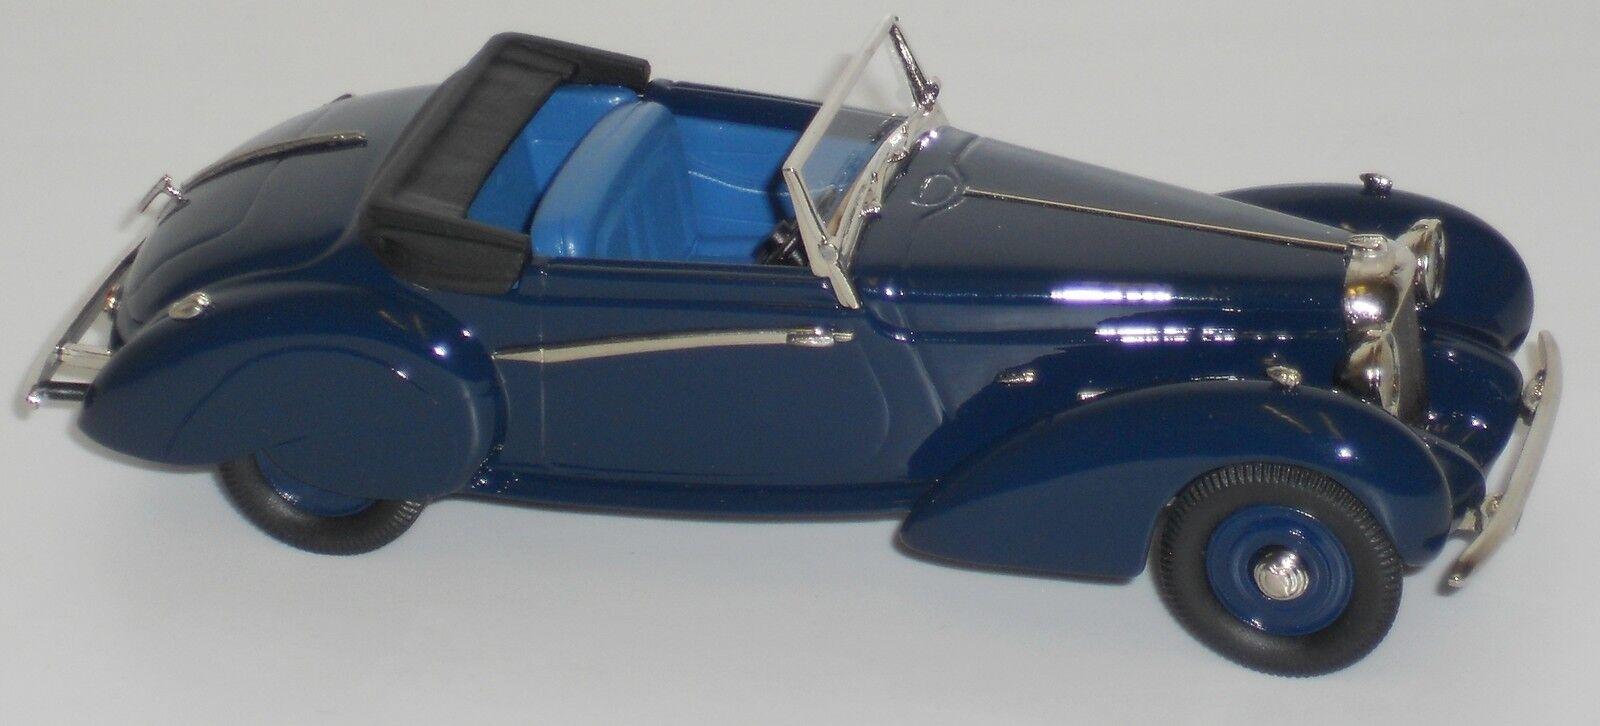 Ldm78a lagonda v12 vantage lansdowne - 1939 drophead coupé 1 43 weißes metall